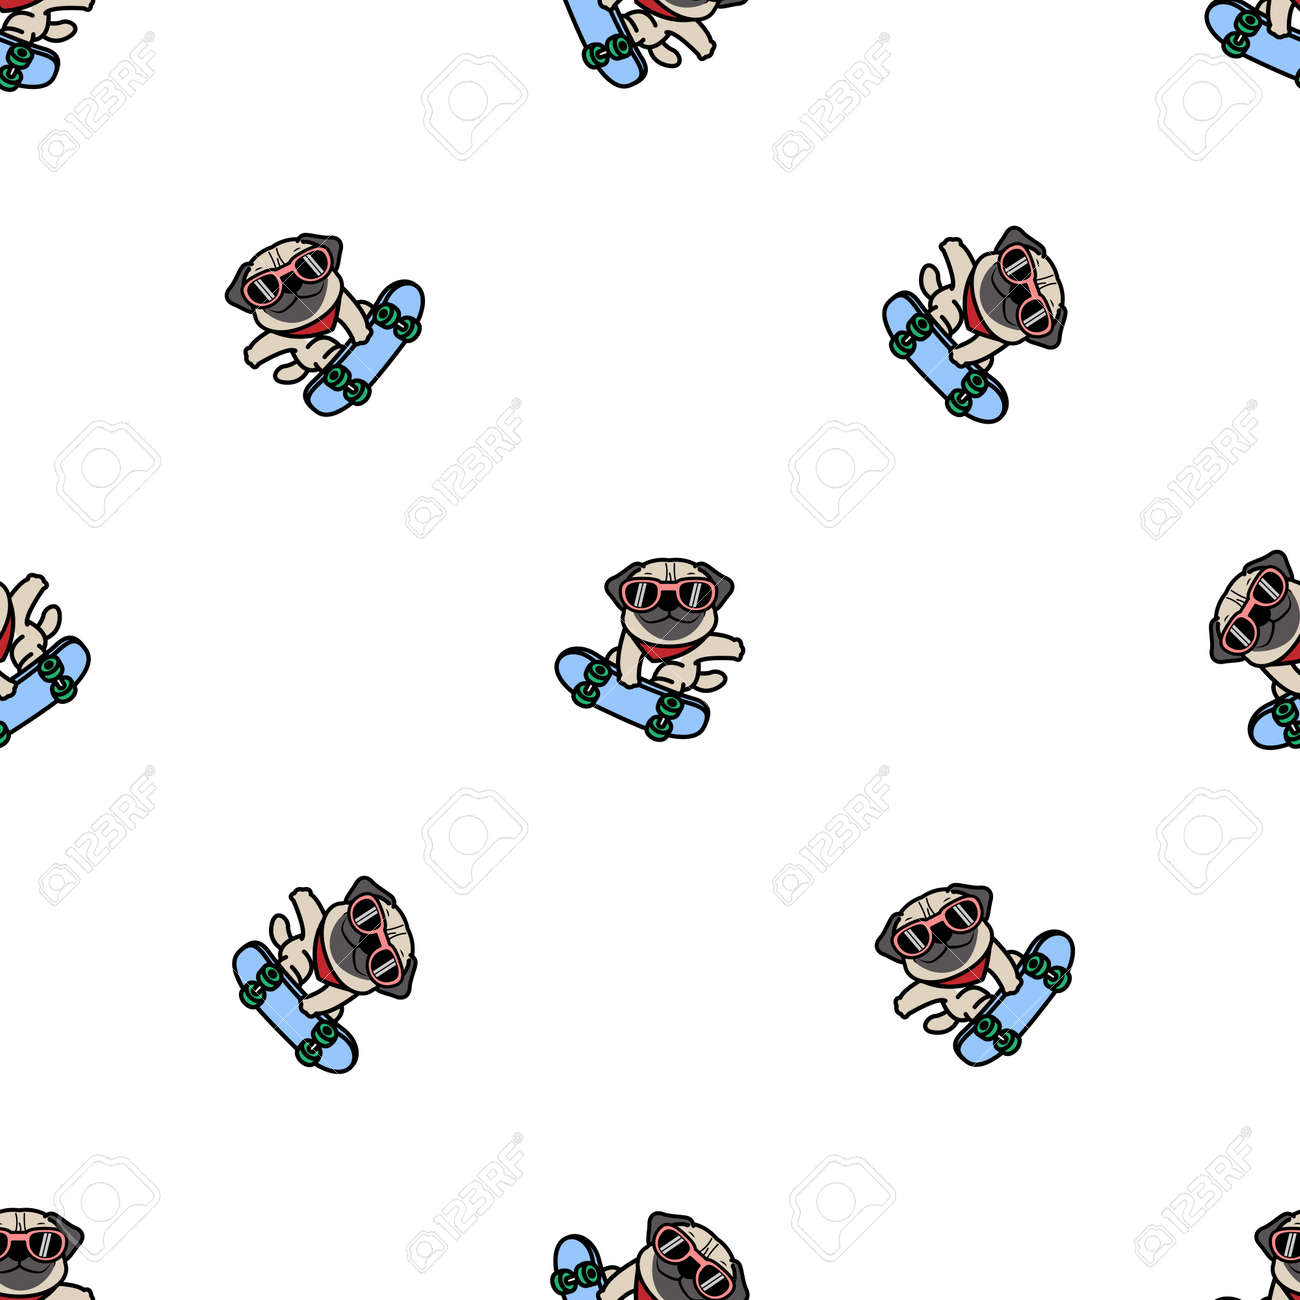 Cute pug dog playing skateboard cartoon, vector illustration - 170586852